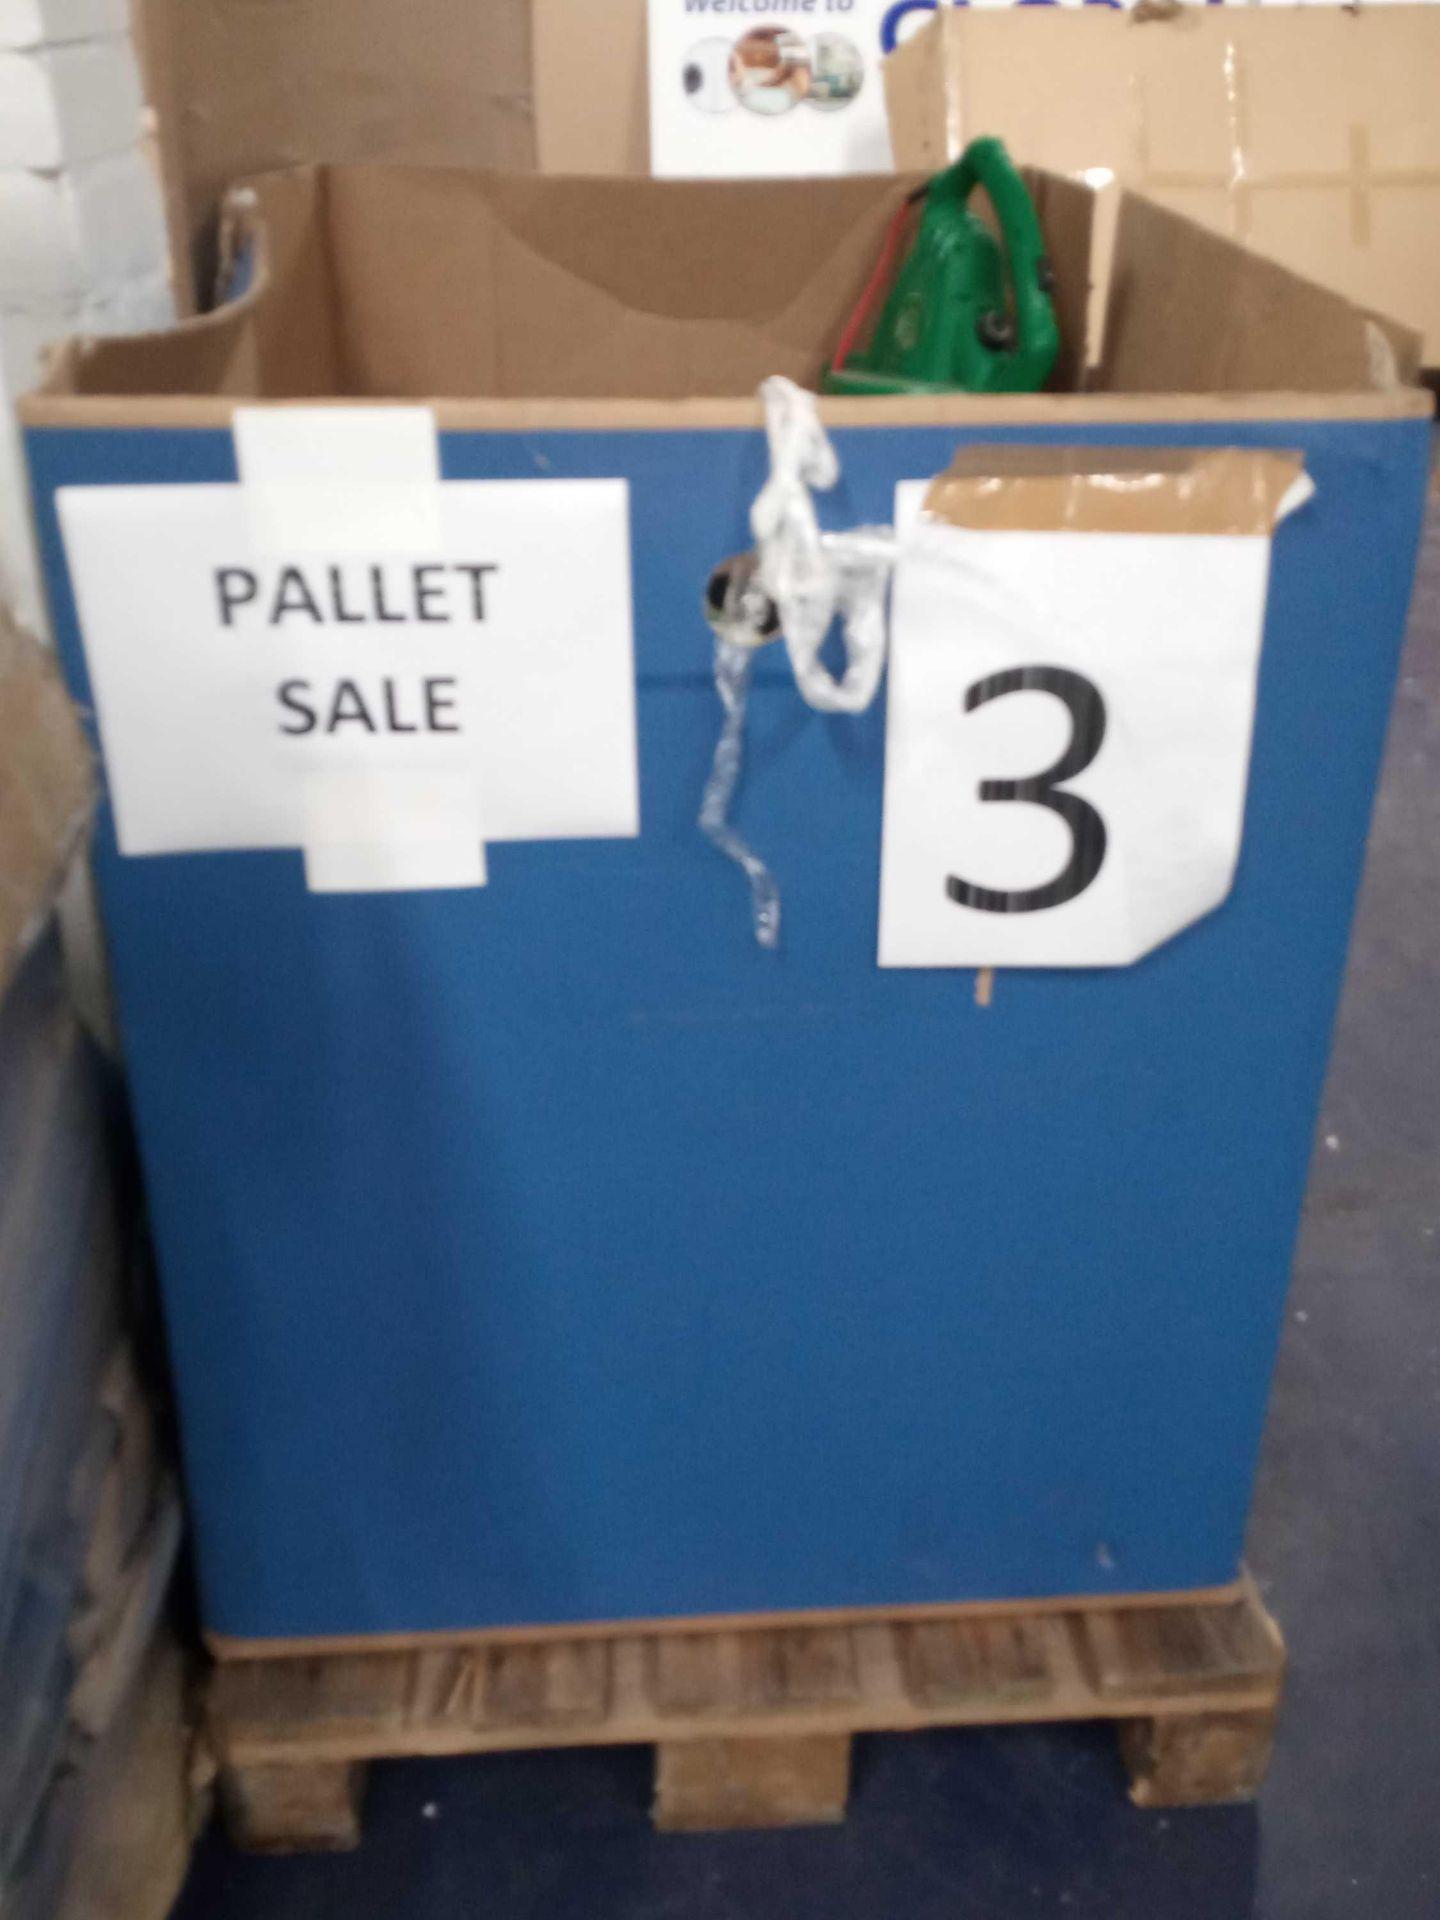 RRP £450 Pallet Of Garden Items - Image 2 of 2